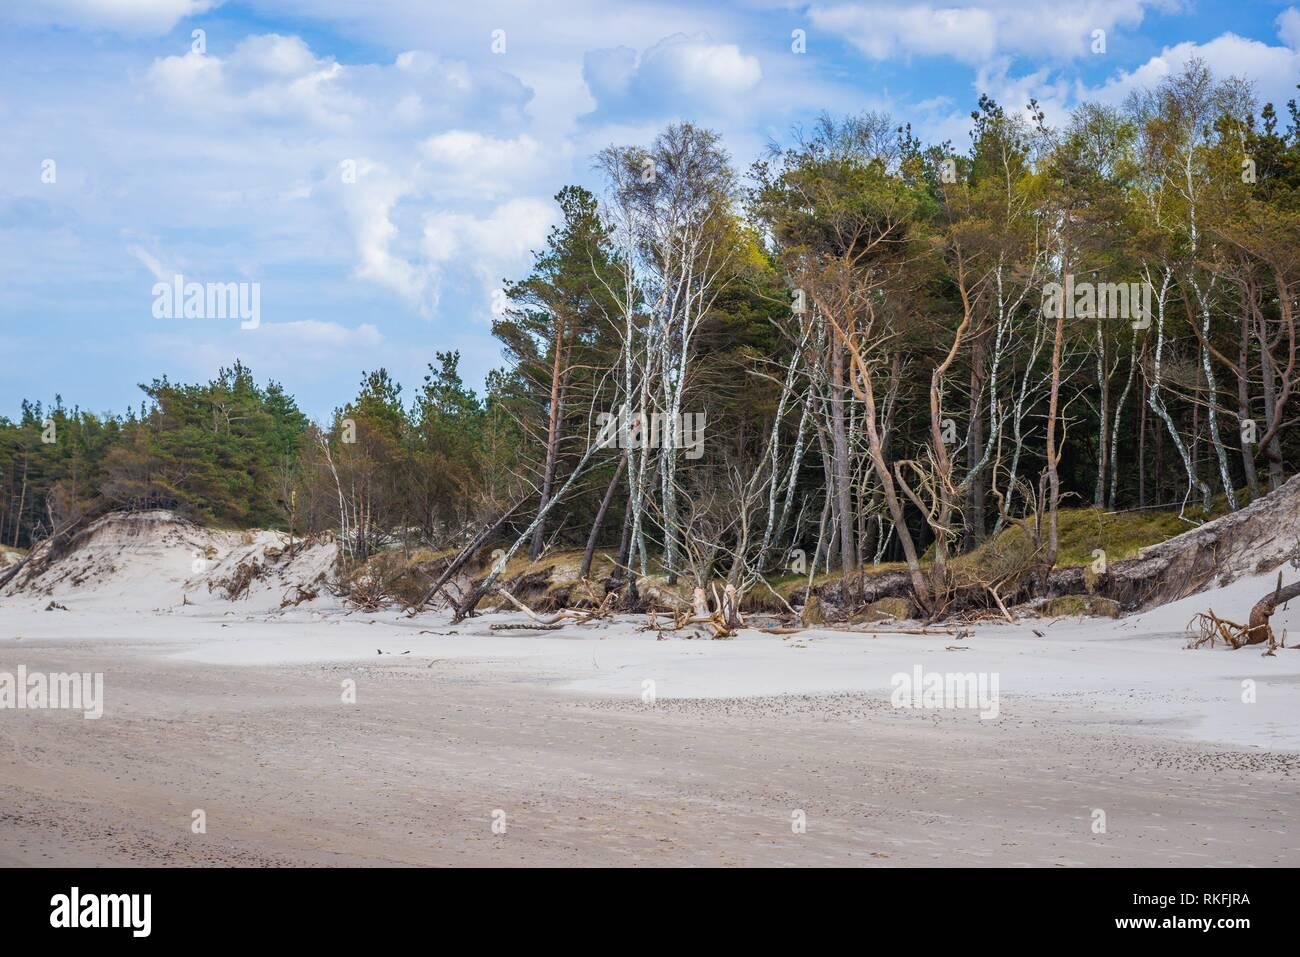 Shoreline erosion in strict protection area of Slowinski National Park on the Baltic coast in Pomeranian Voivodeship, Poland. Stock Photo